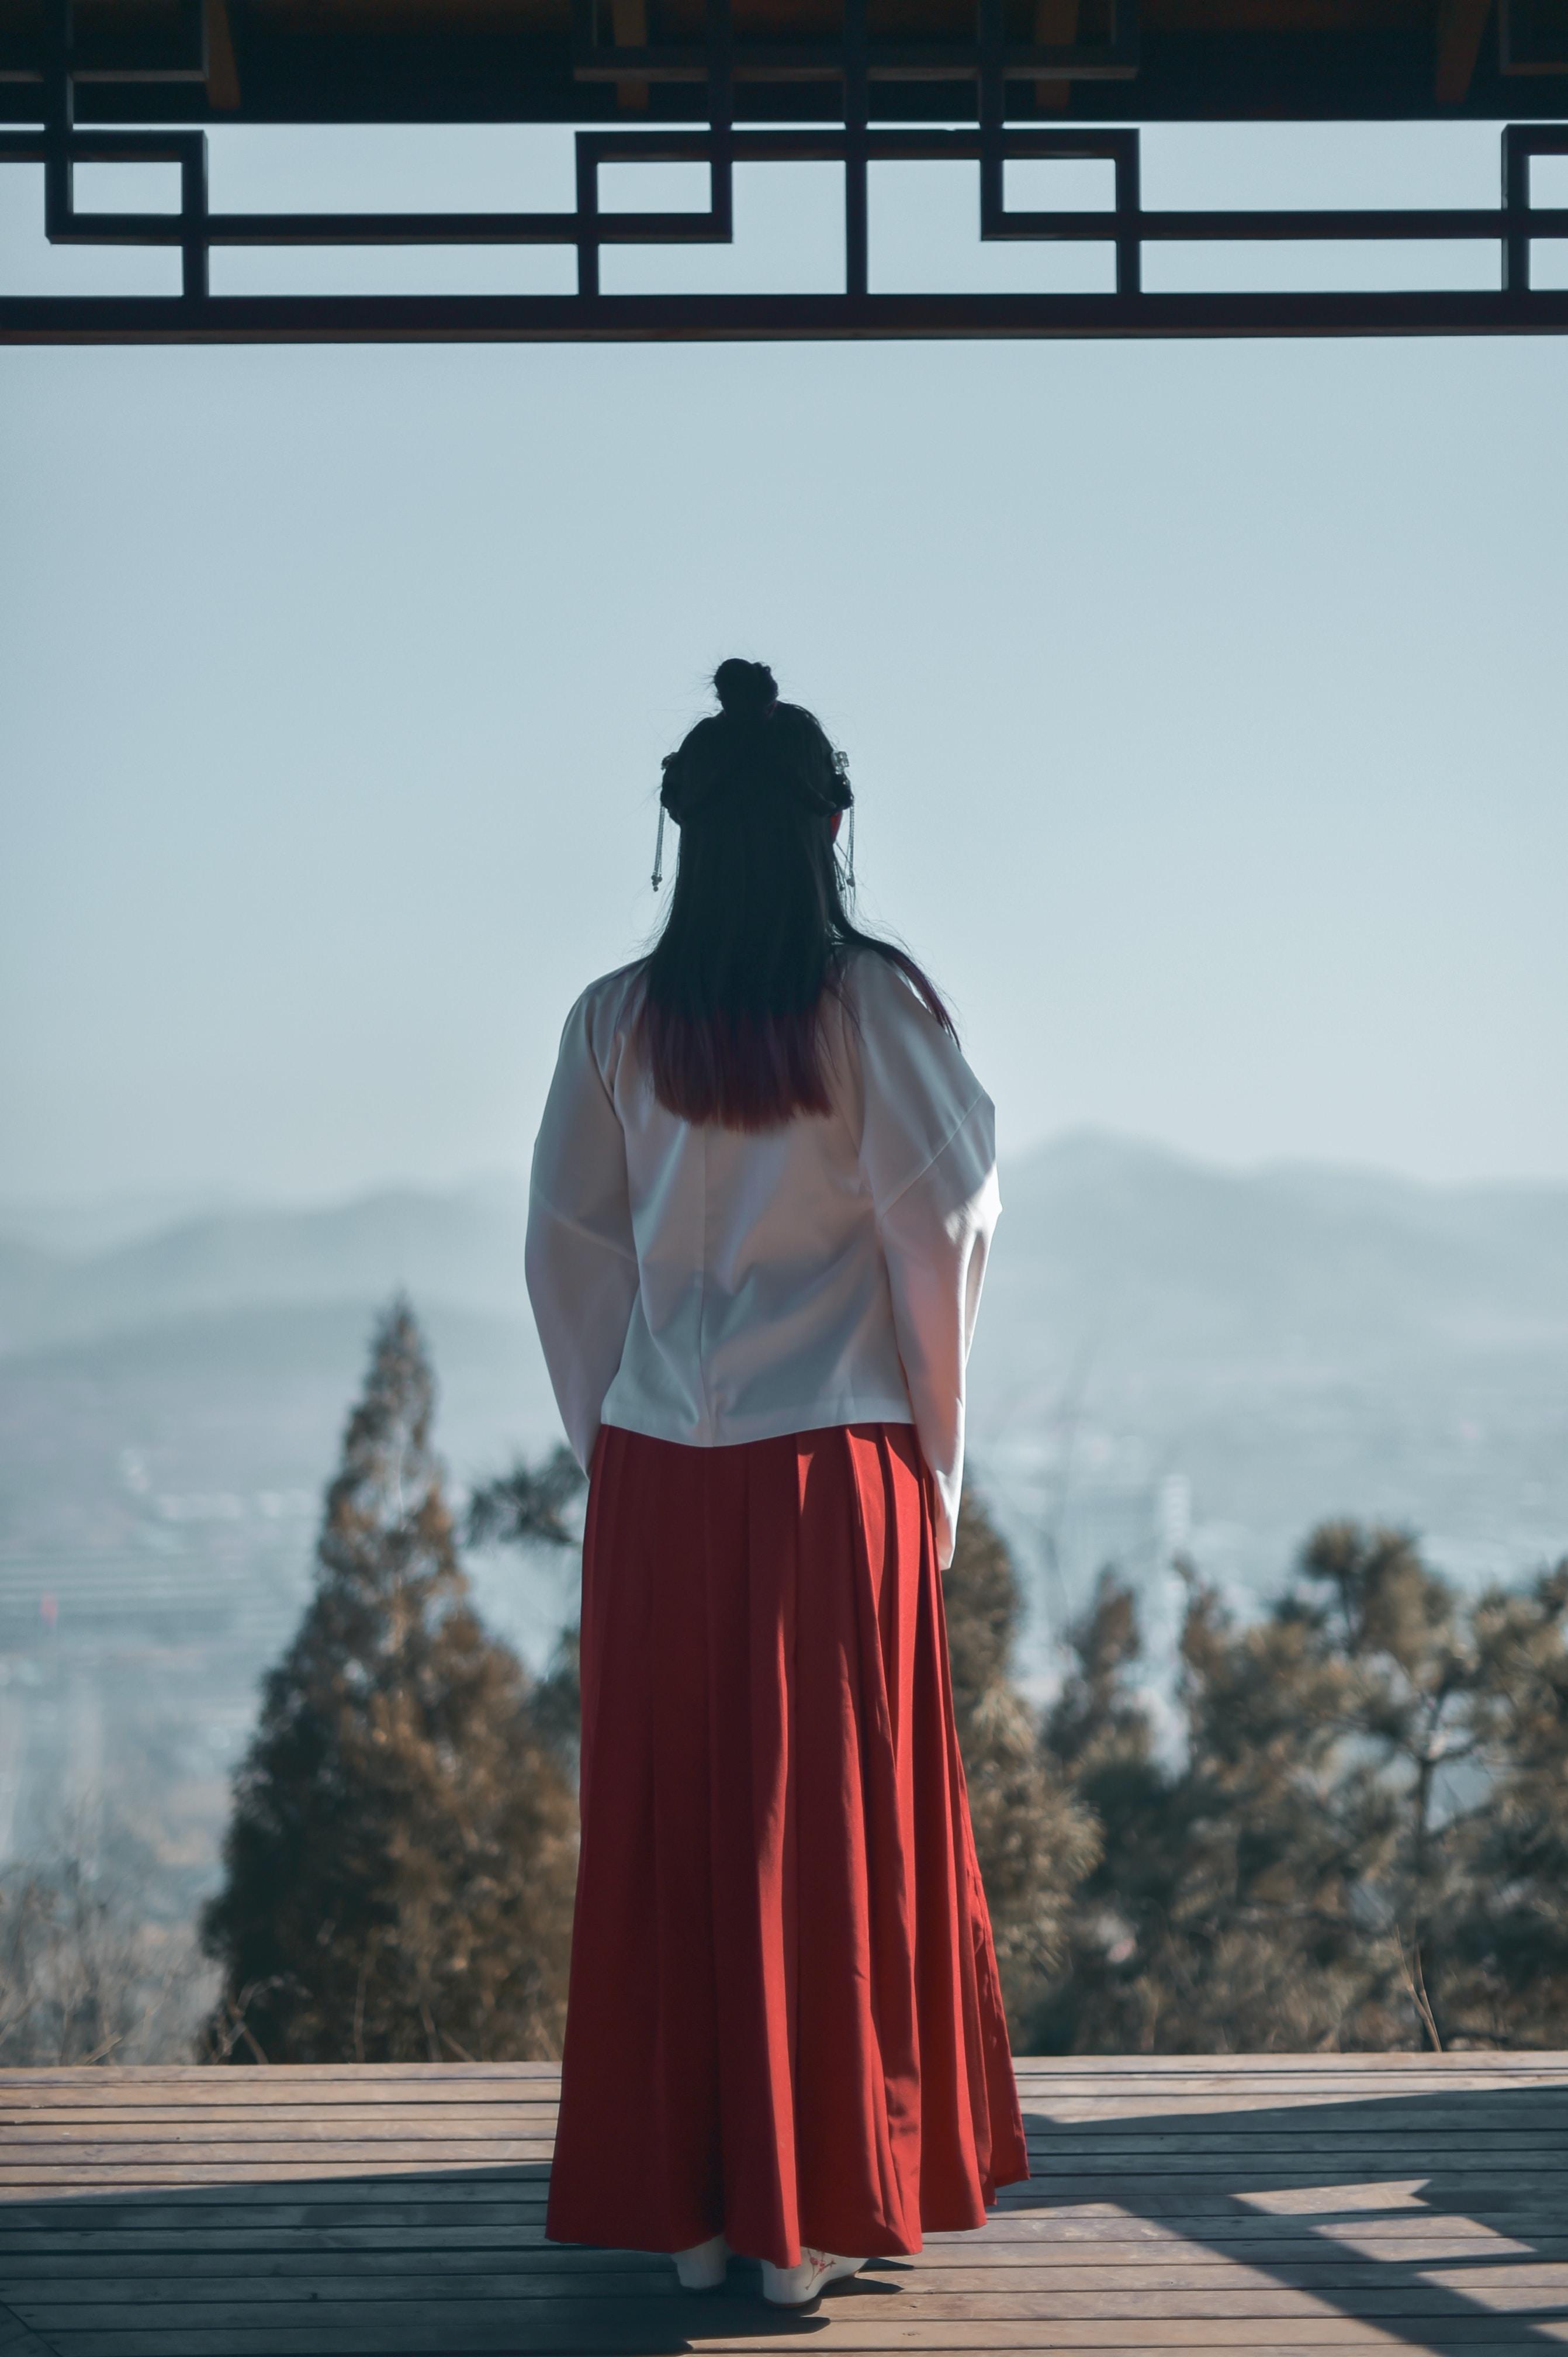 woman searing white and red kimono